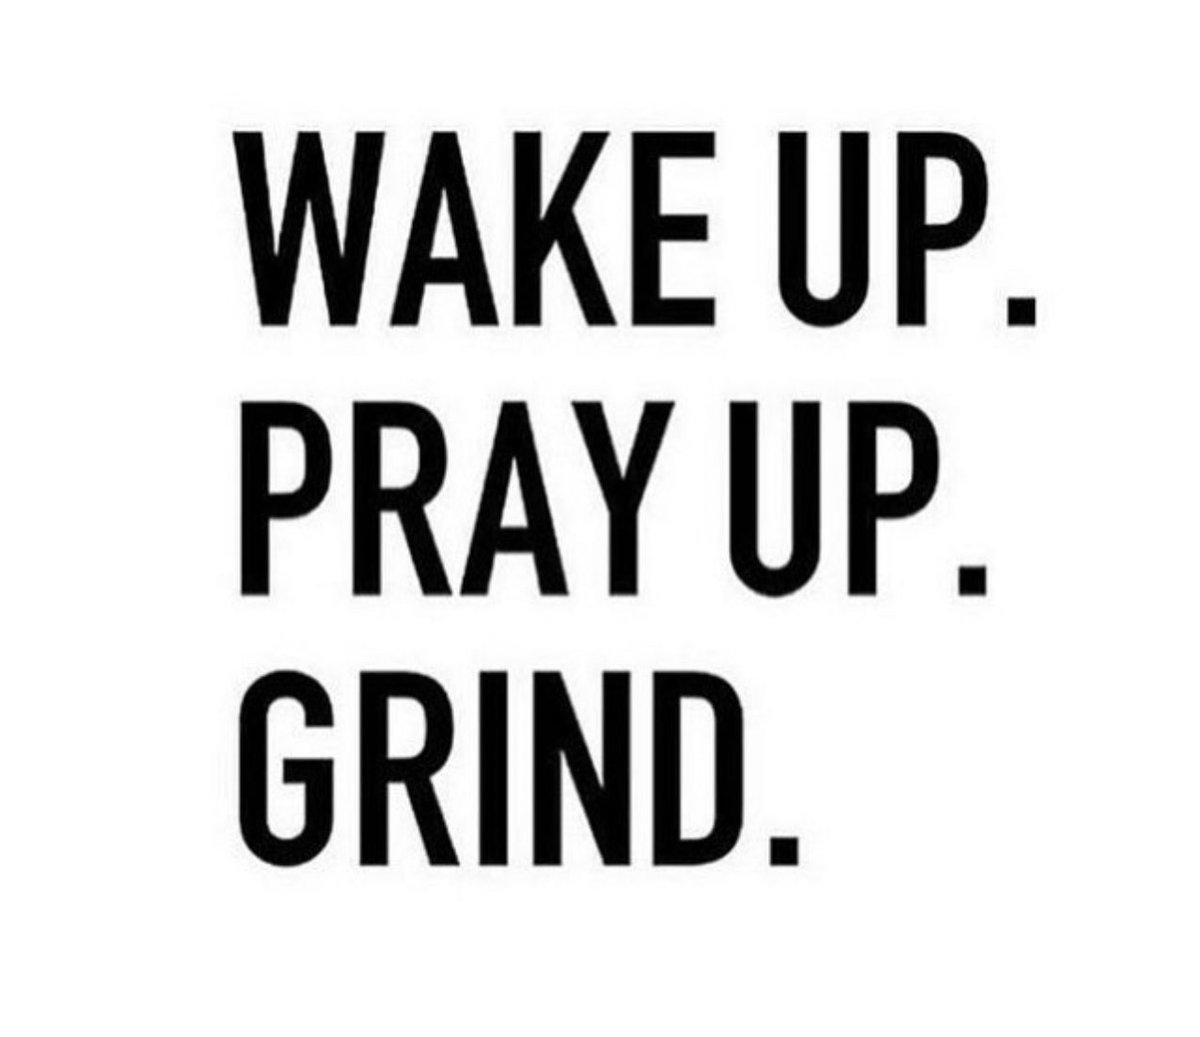 𝗛𝗮𝗽𝗽𝘆 𝗙𝗿𝗶𝗱𝗮𝘆!✨ #tgif #fridayvibes #fridayfeeling #pray #grind